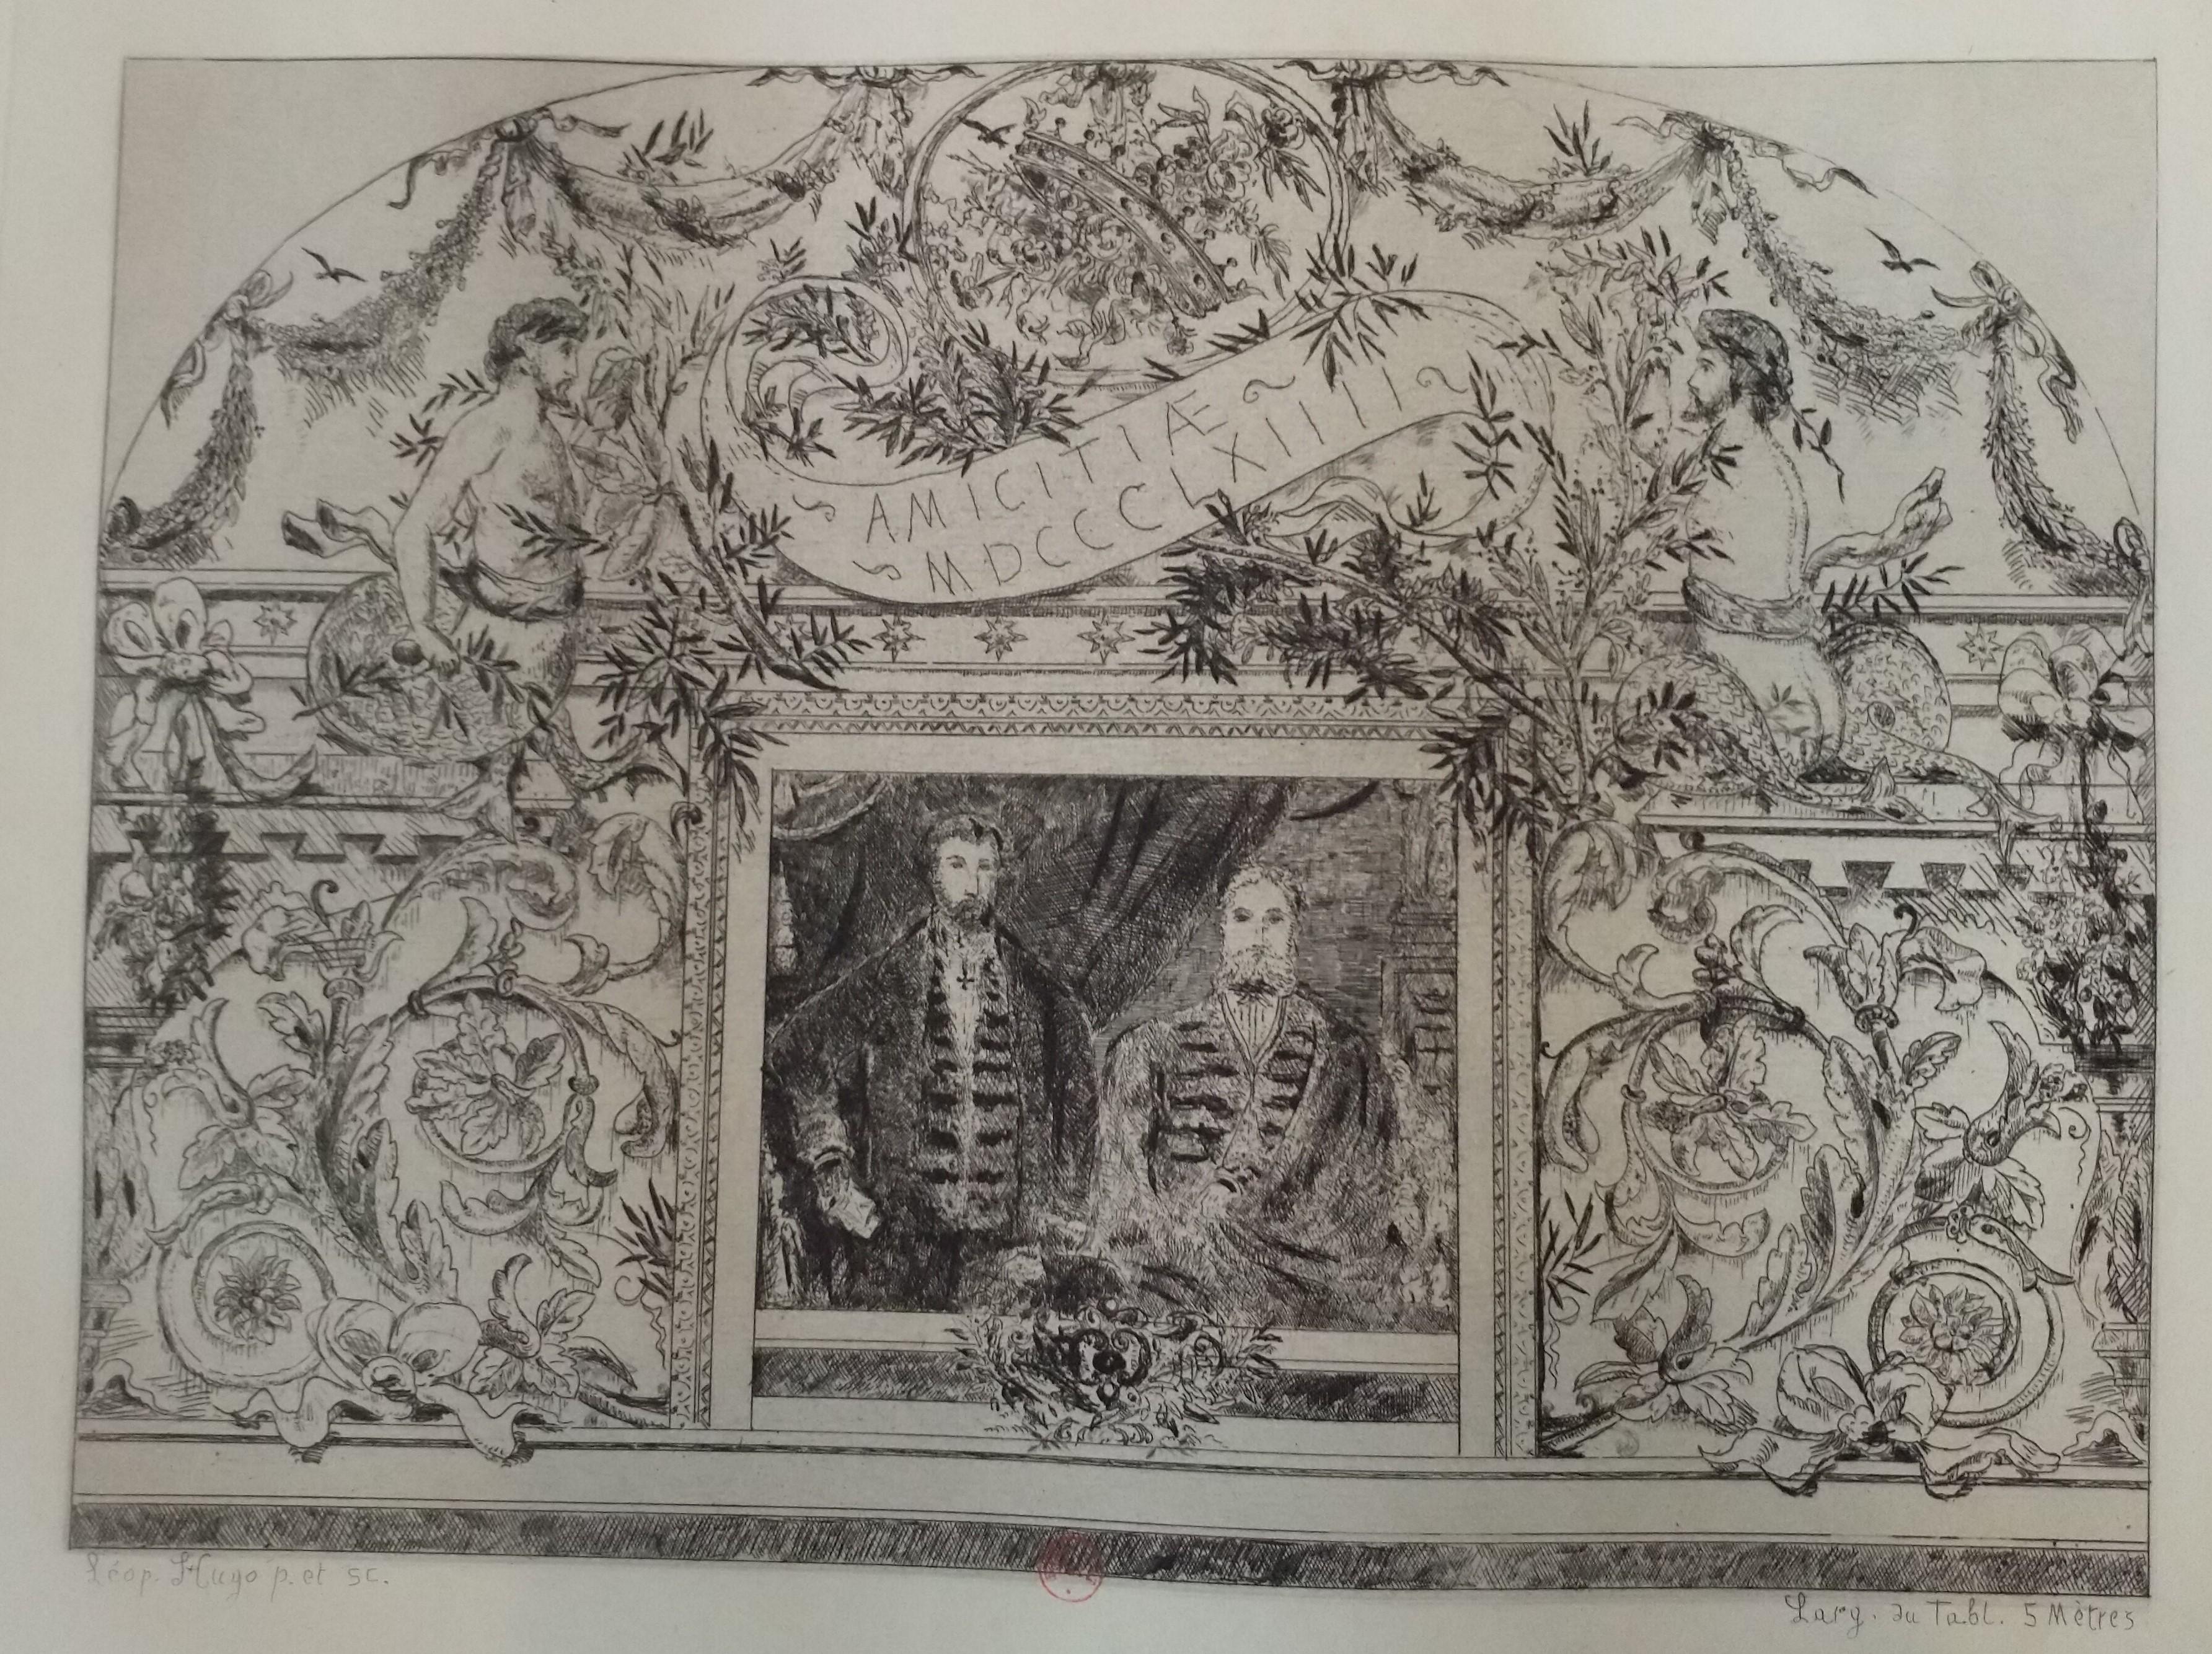 Leopold Armand Hugo BNF 1864 Amicitiae